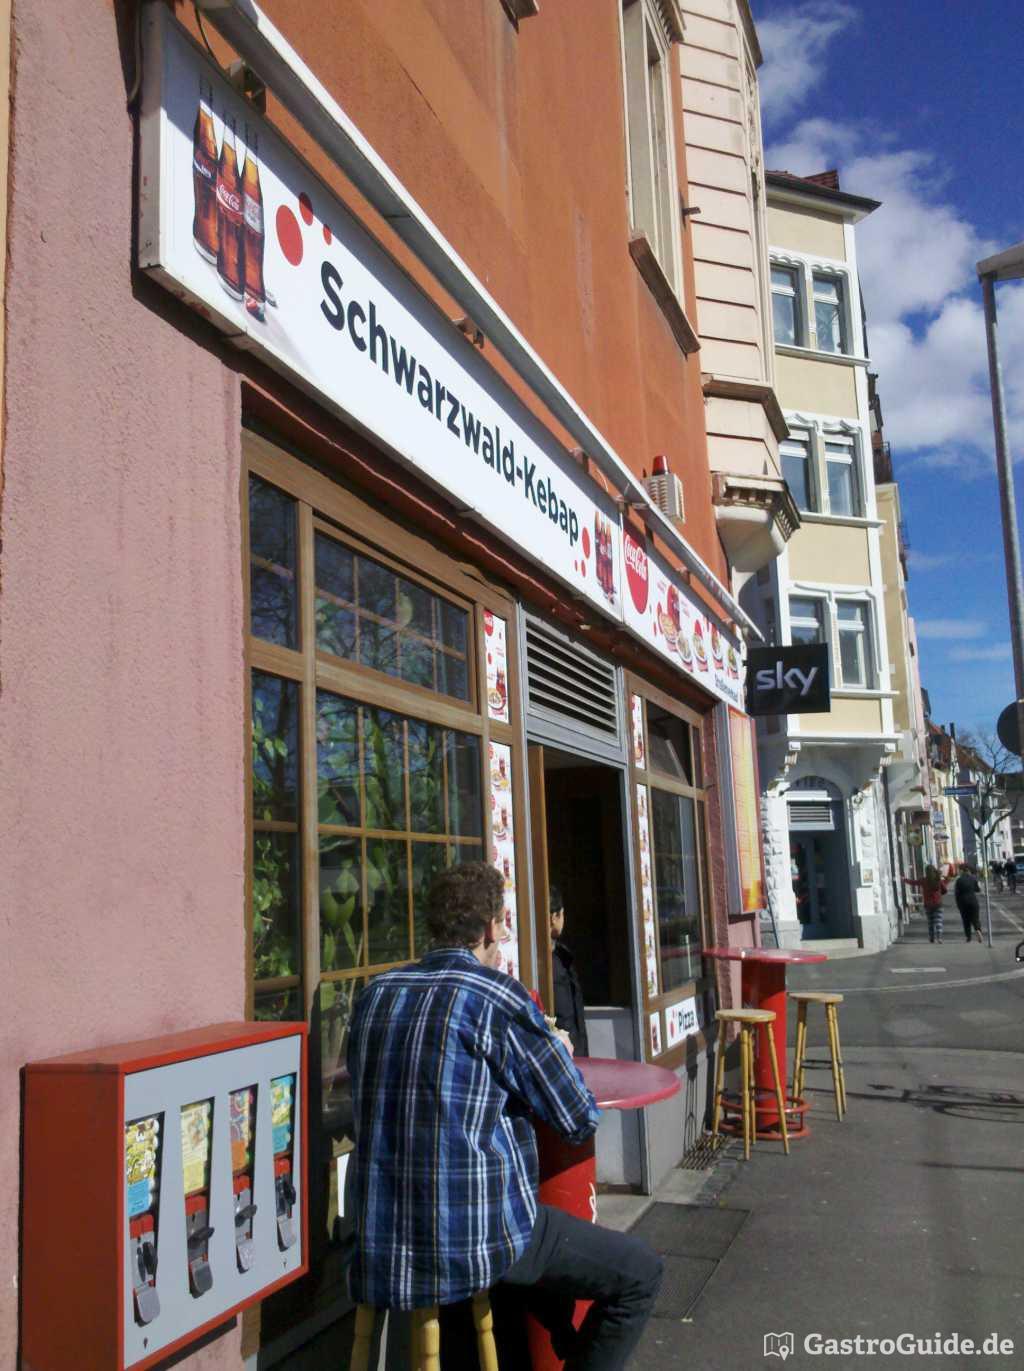 schwarzwald kebap gastro in 79102 freiburg im breisgau oberau. Black Bedroom Furniture Sets. Home Design Ideas